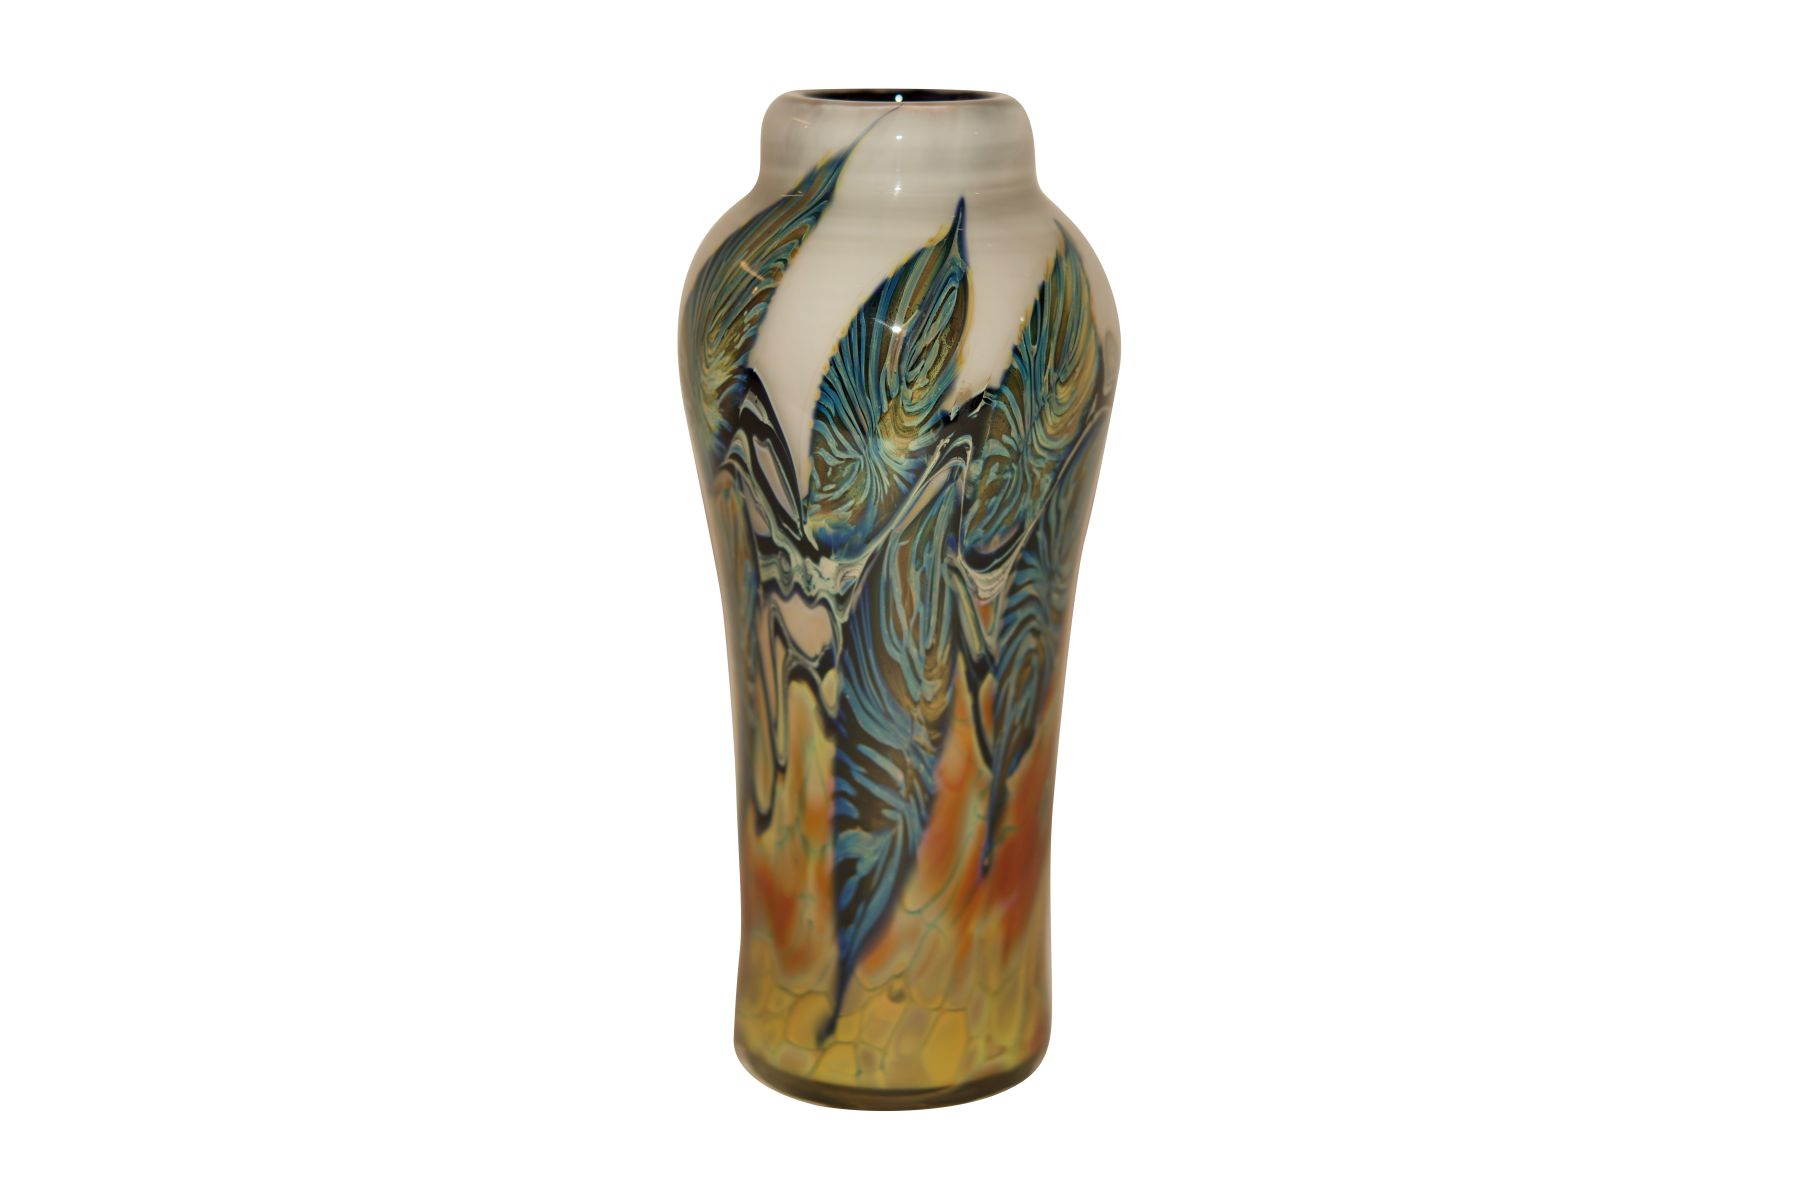 #100 Rare vase | Seltene Vase Image